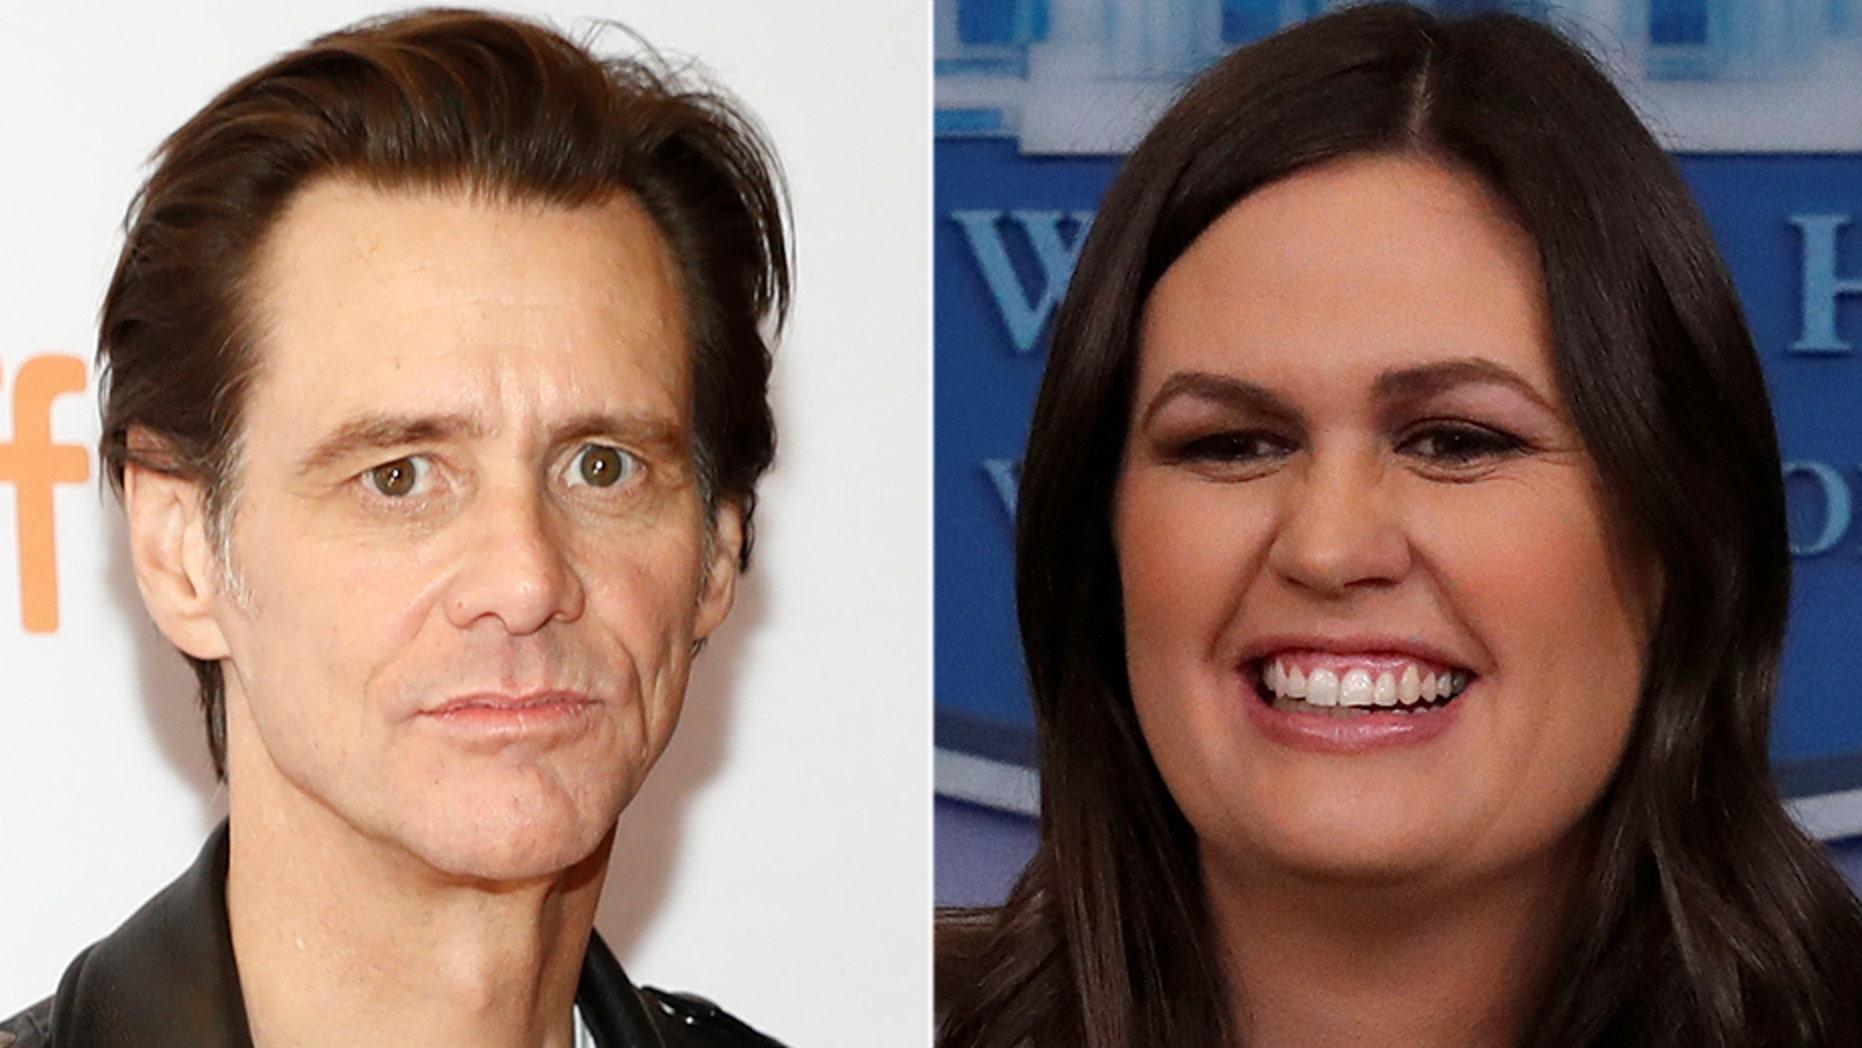 Actor Jim Carrey has painted a portrait of White House Press Secretary Sarah Sanders.